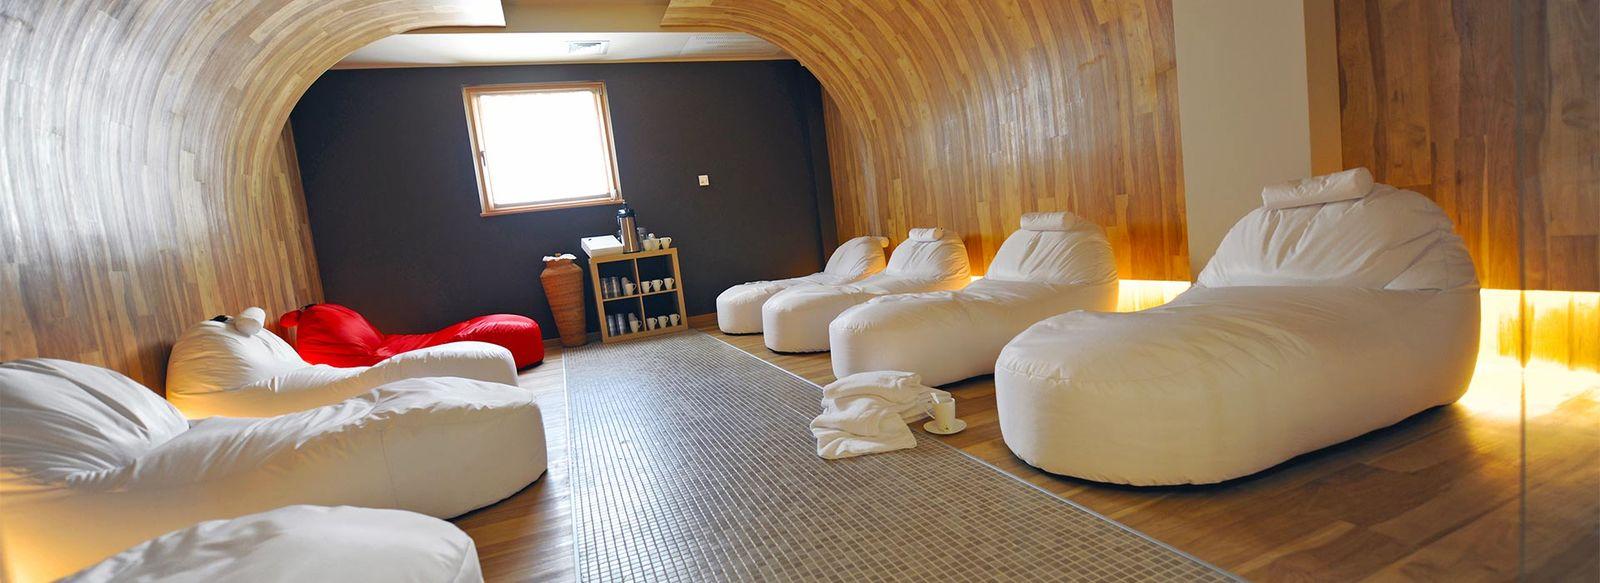 Wellness in design hotel